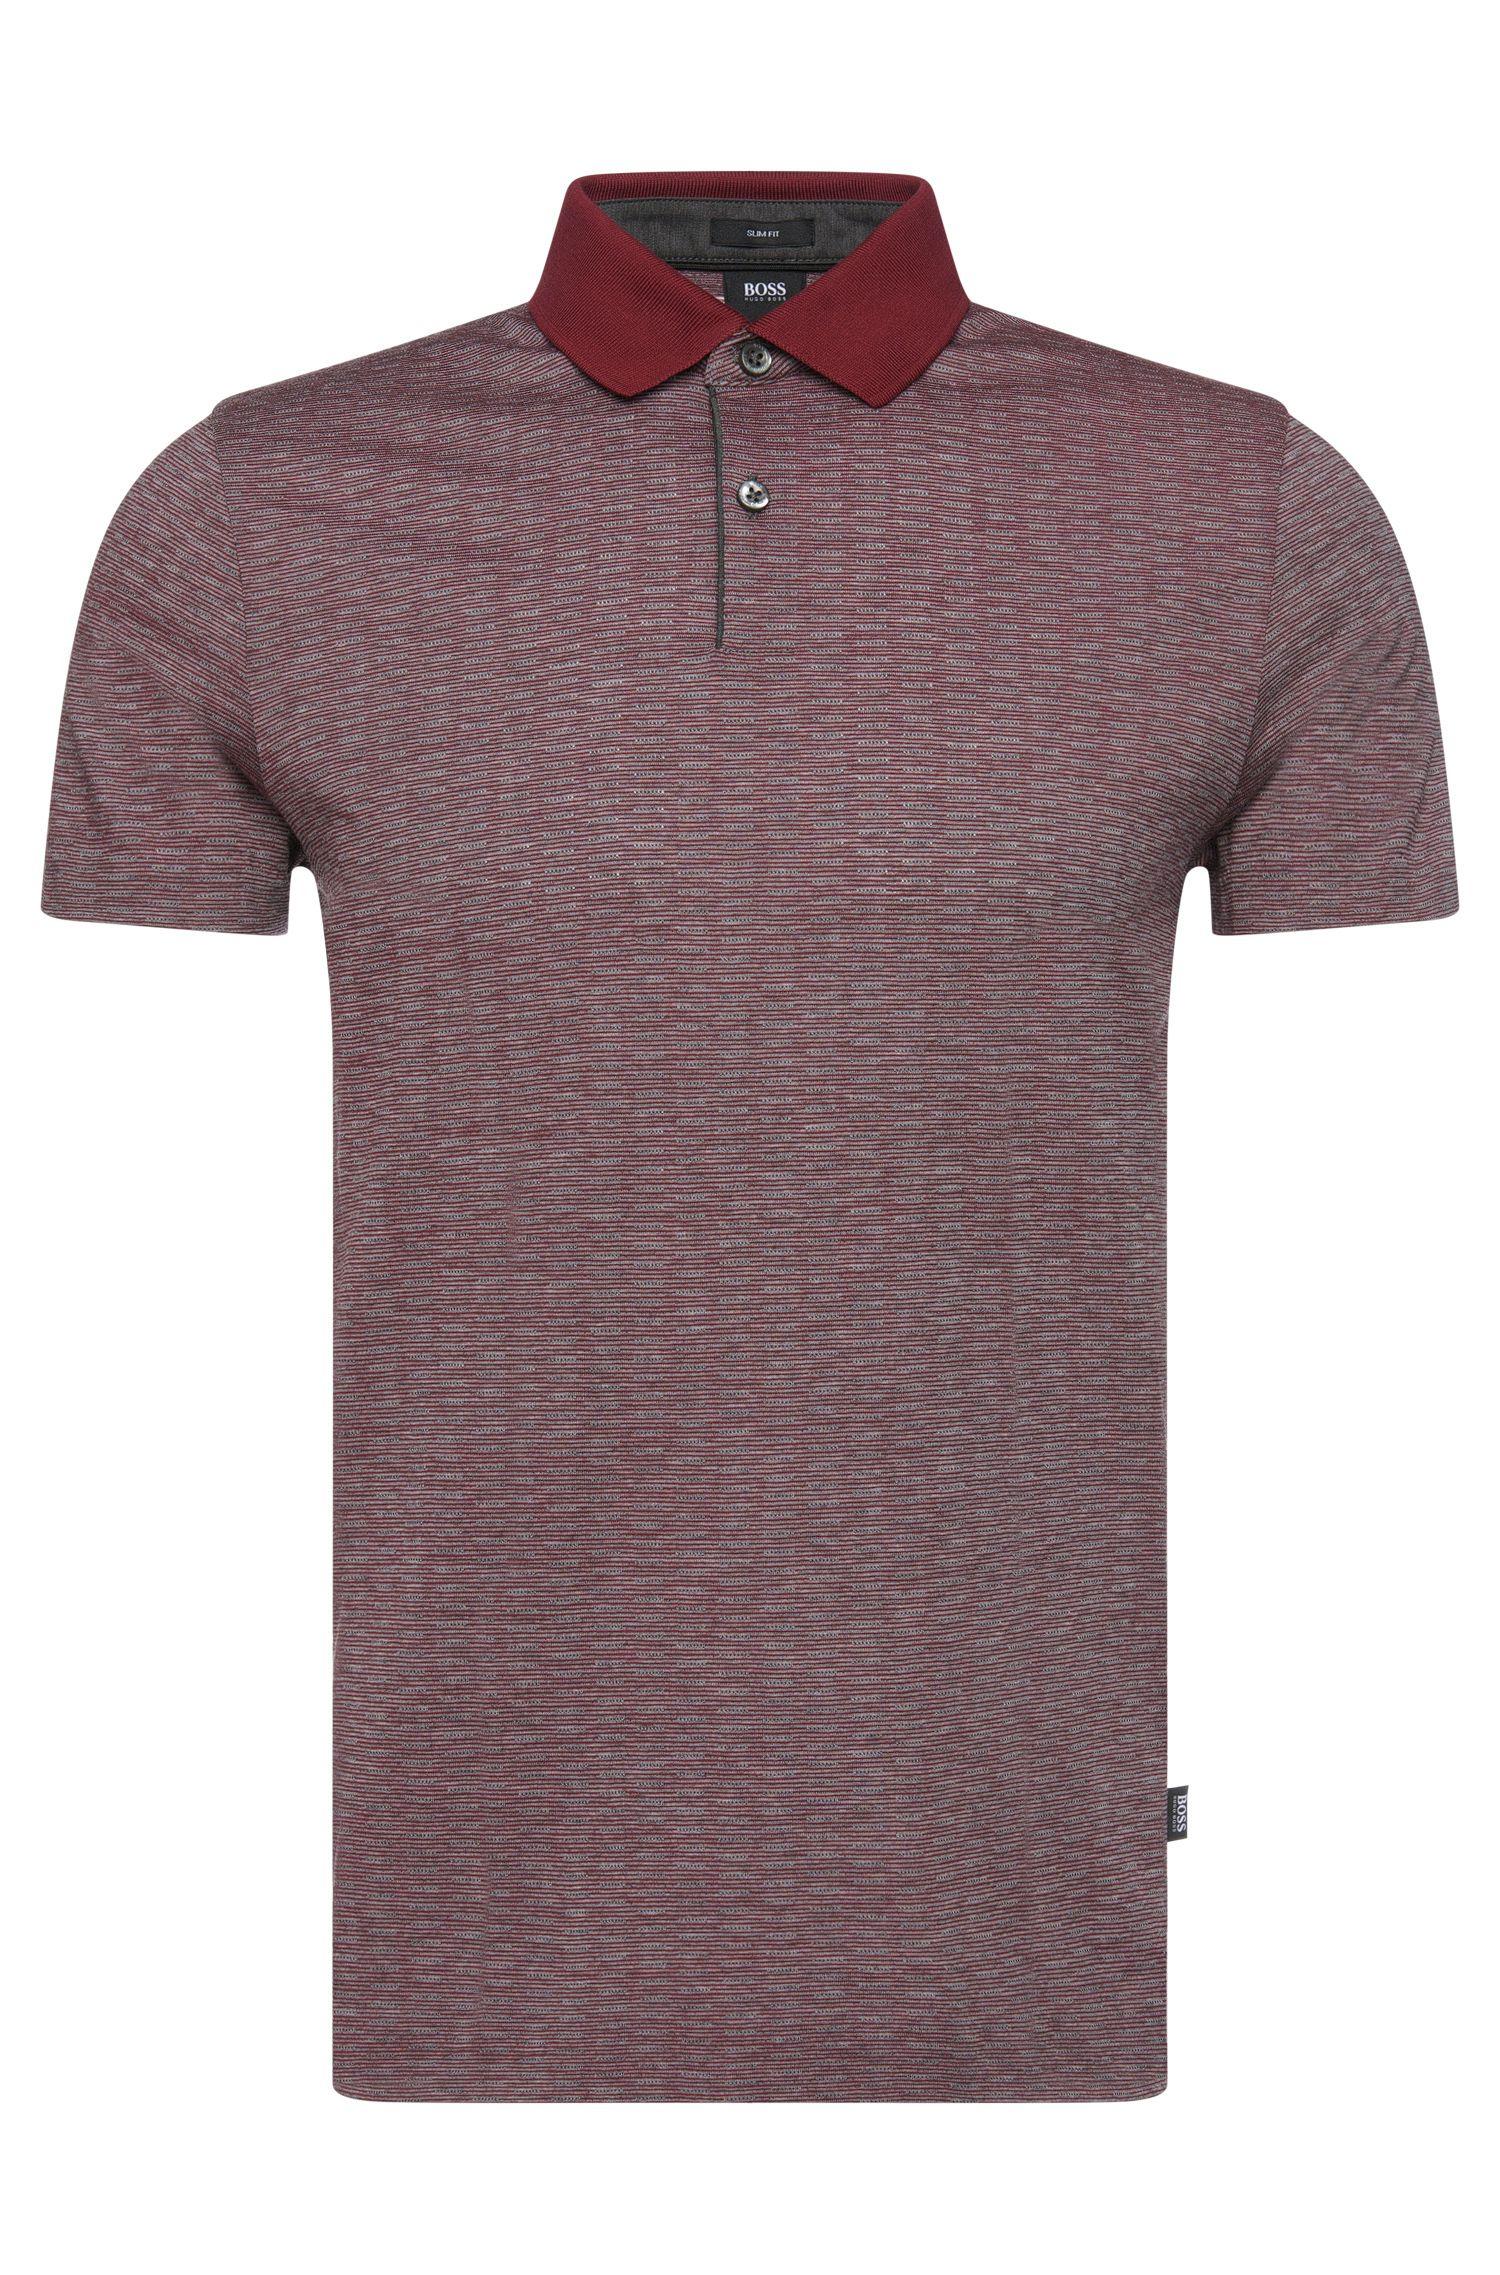 'Parks' | Slim Fit, Wool Cotton Finestripe Polo Shirt